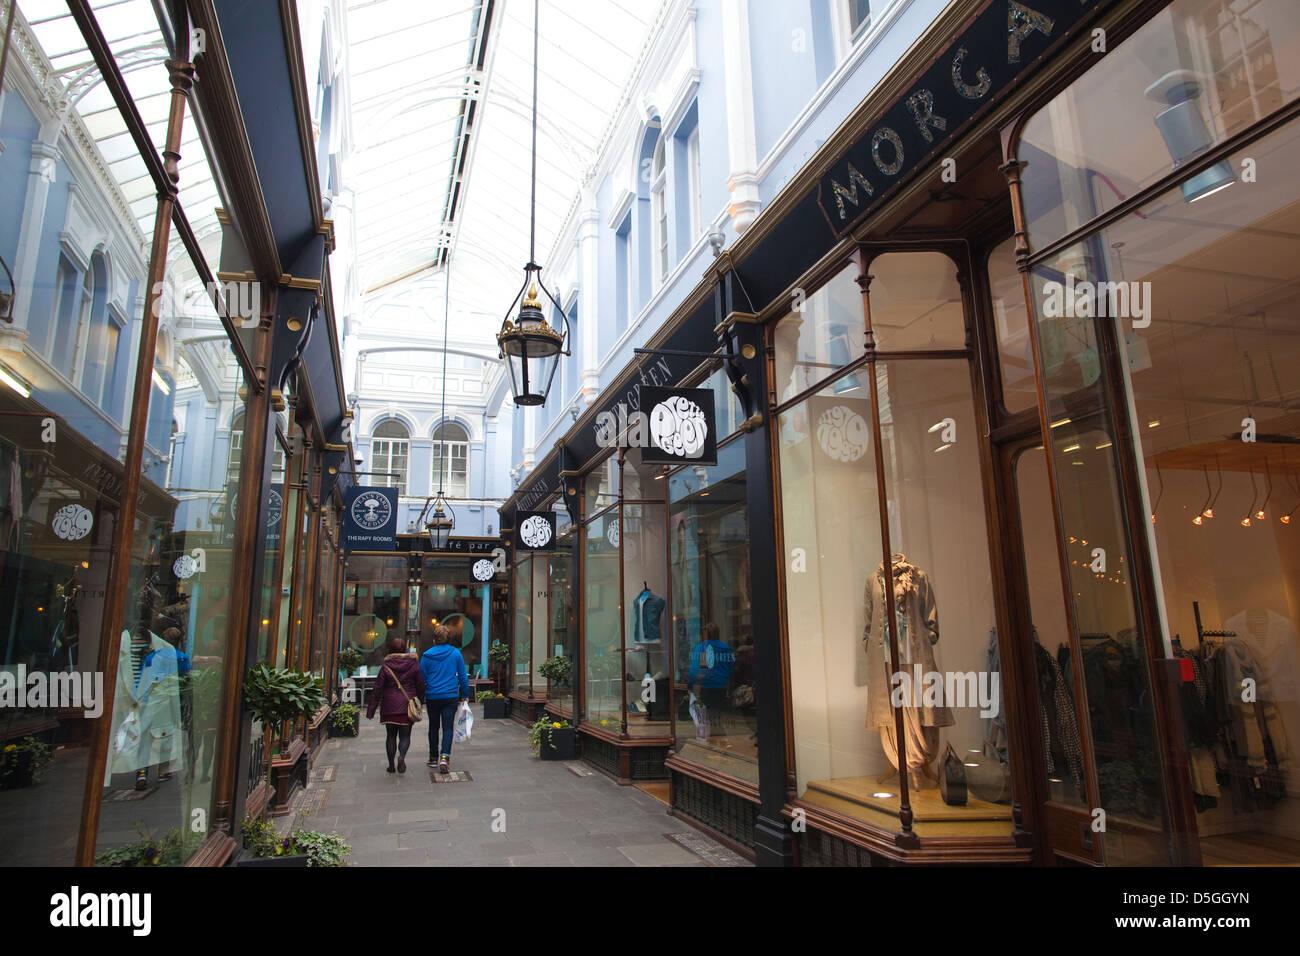 Morgan Arcade, Cardiff city centre, Wales, UK - Stock Image